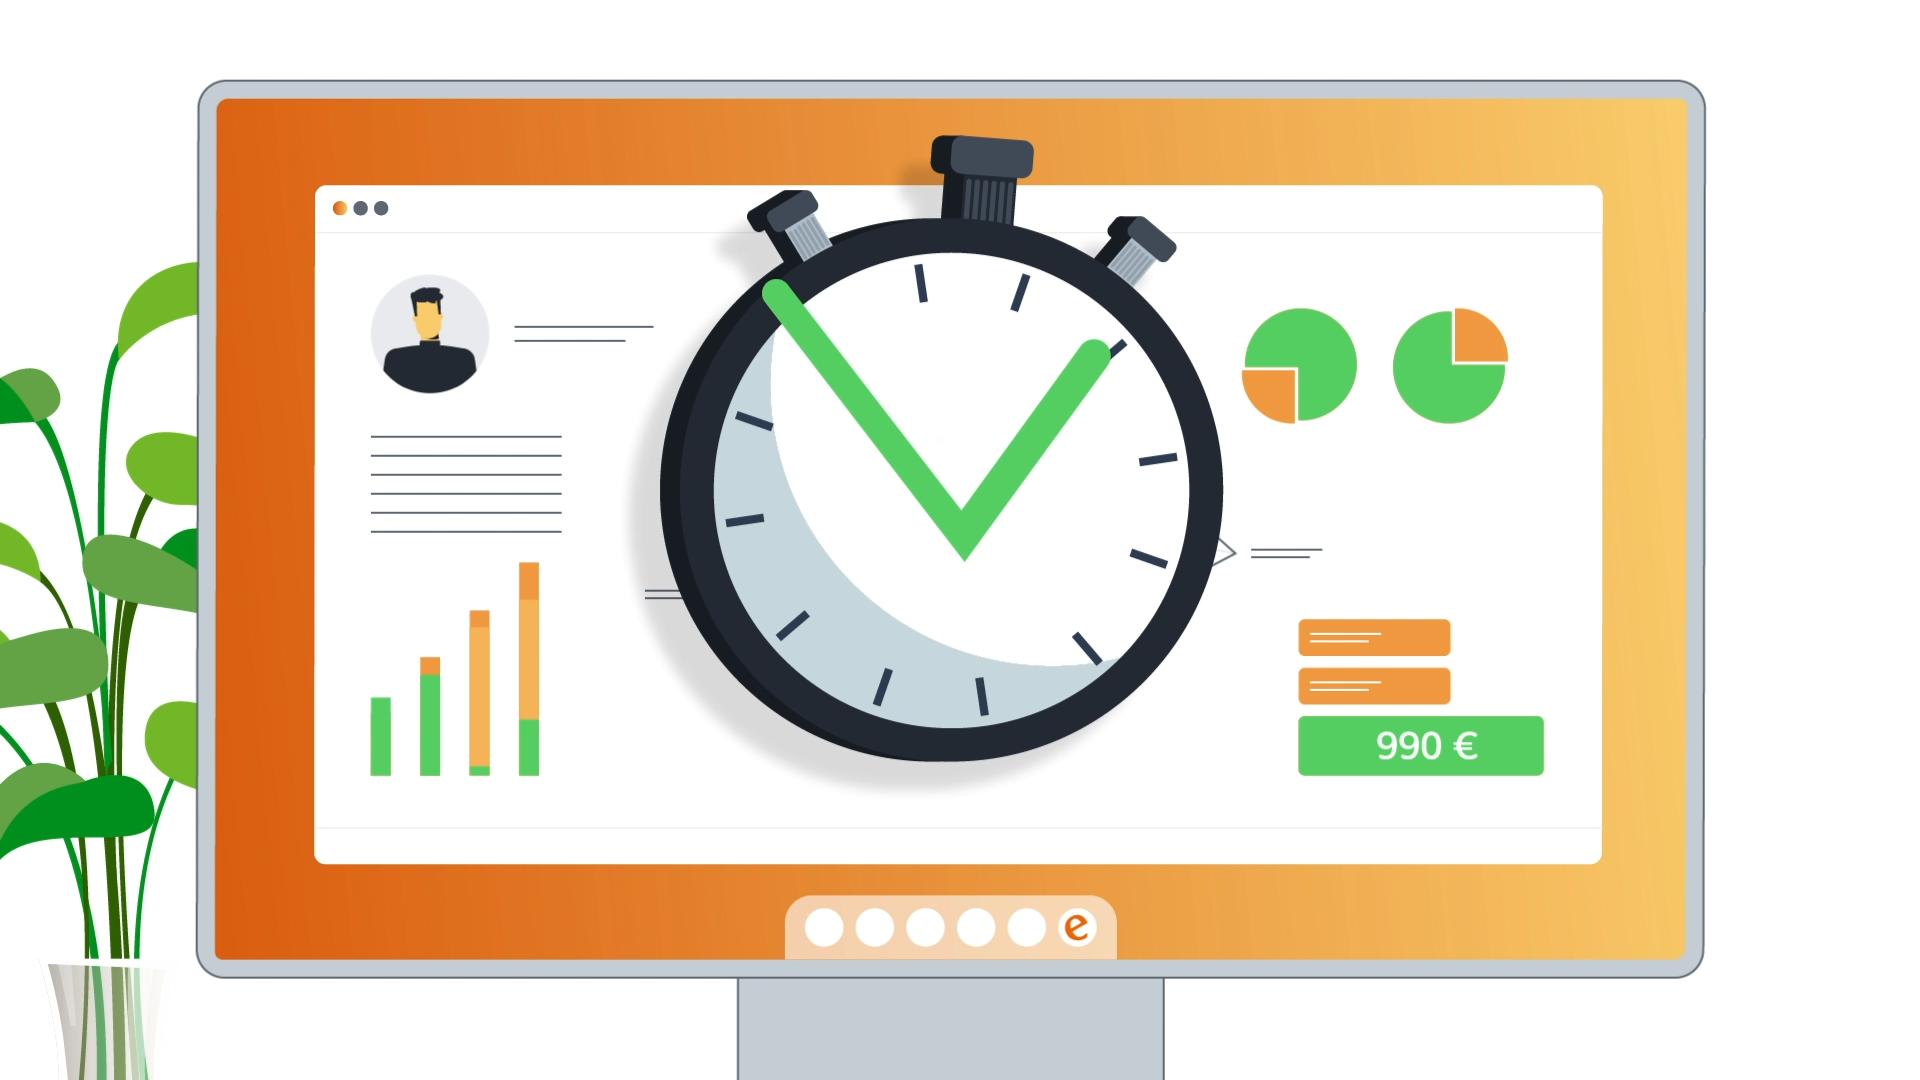 Présentation Incentive Manager ToolSuite Motion Design - EN